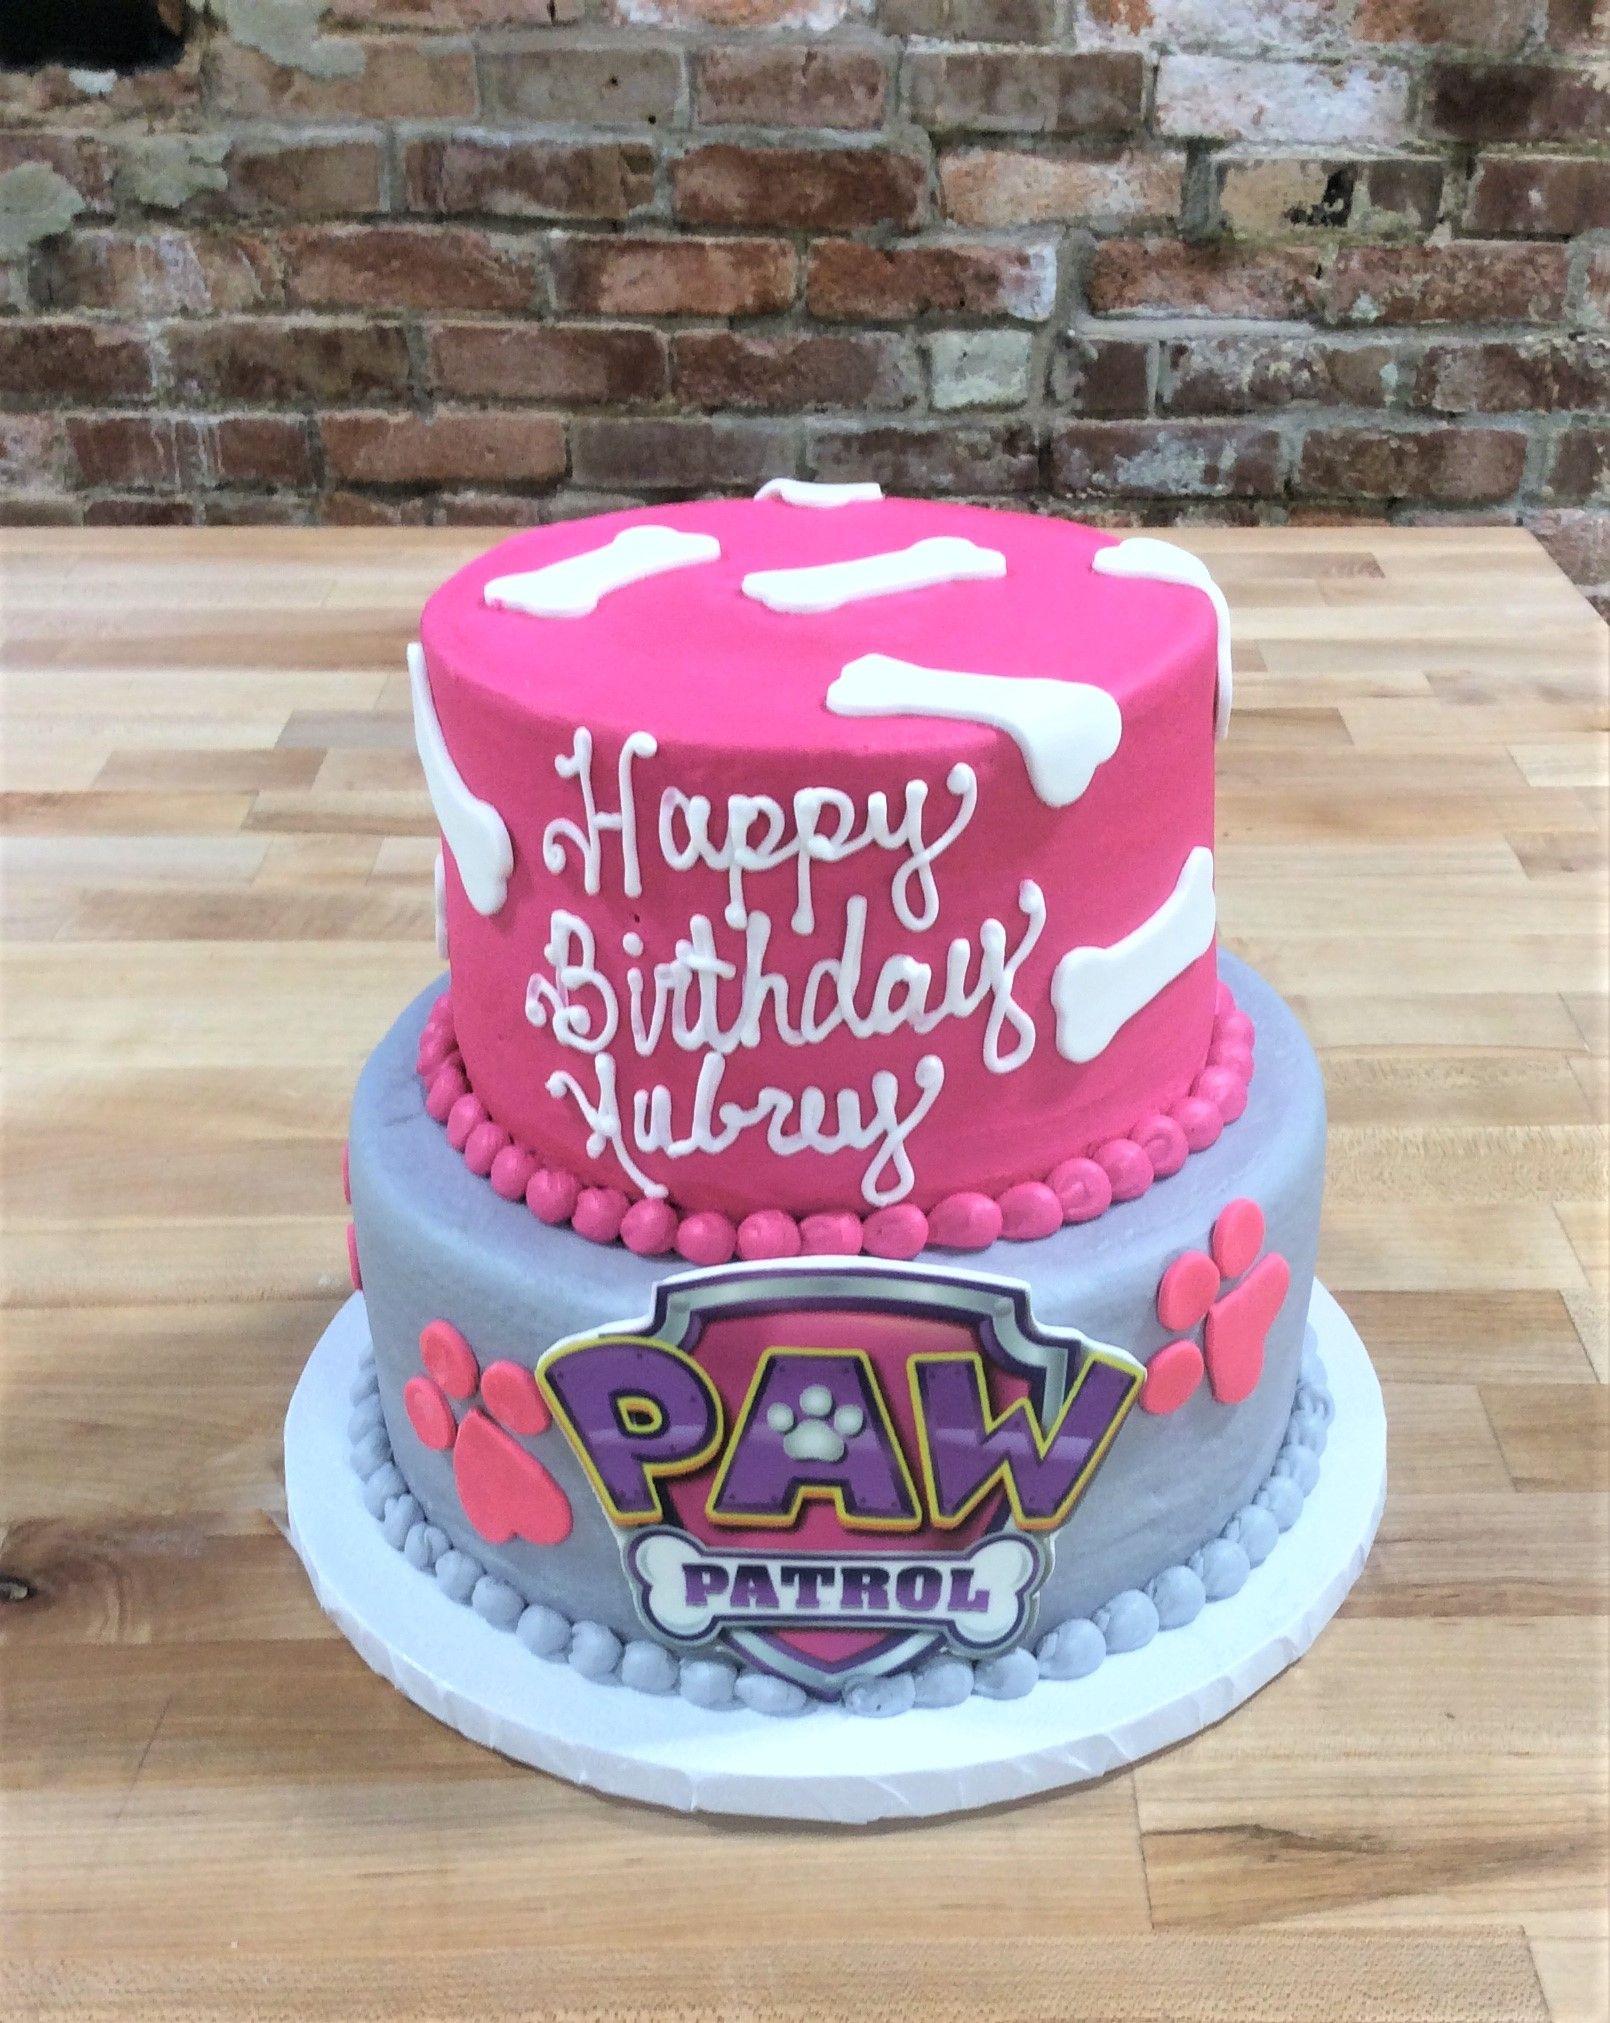 Girlie paw patrol party cake madisonus th birthday pinterest